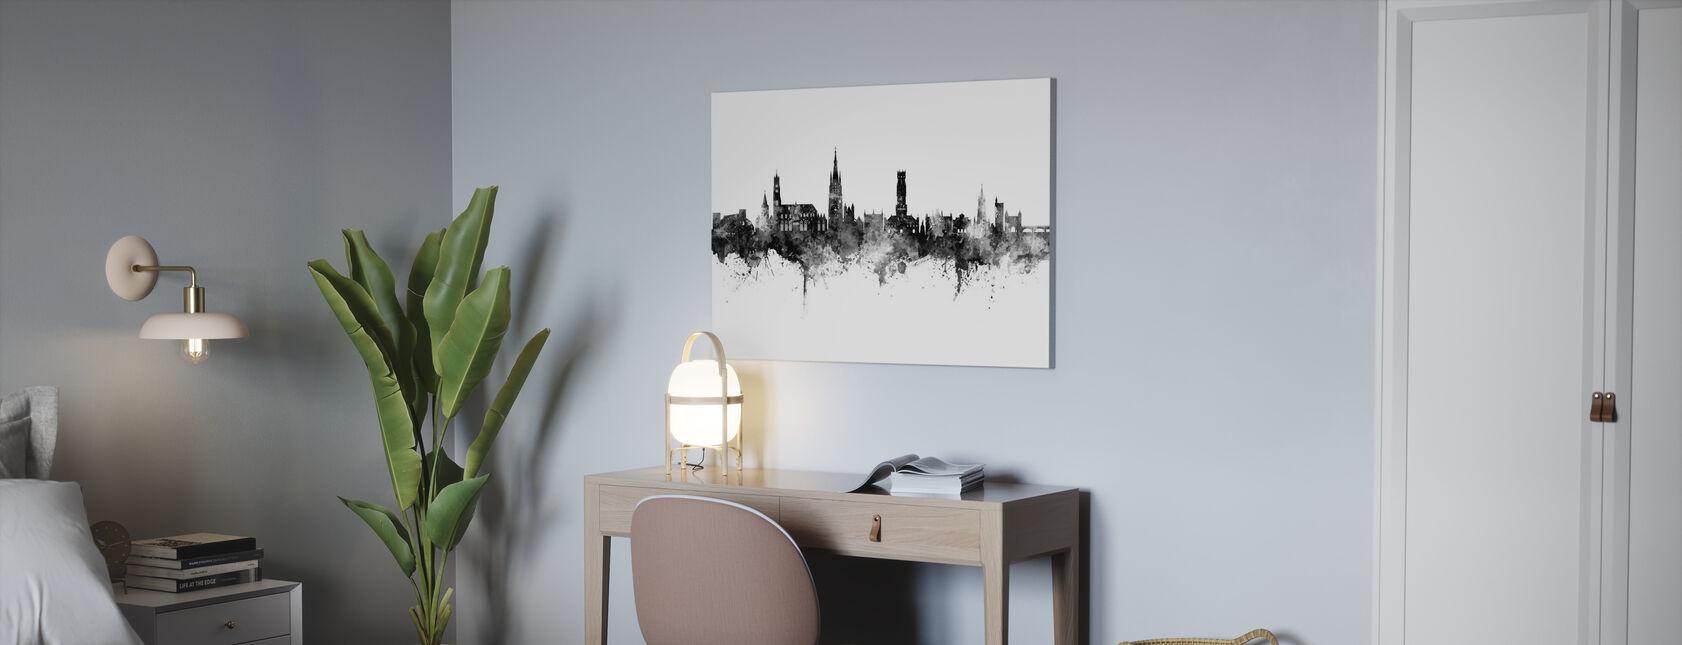 Bruges Belgium Skyline - Canvas print - Office